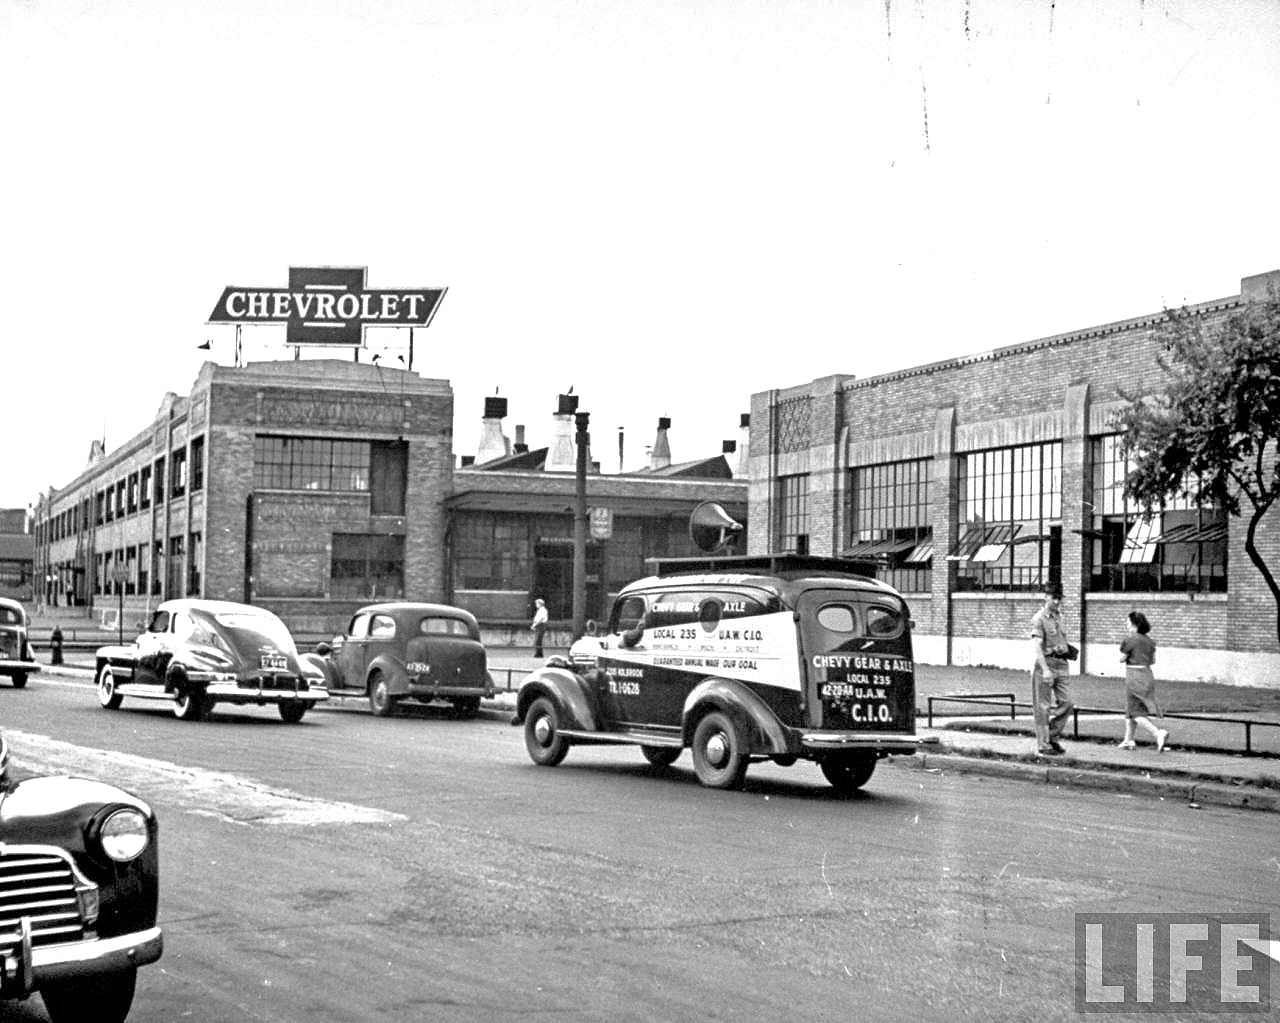 Detroit car makers produce for World War II (1942)